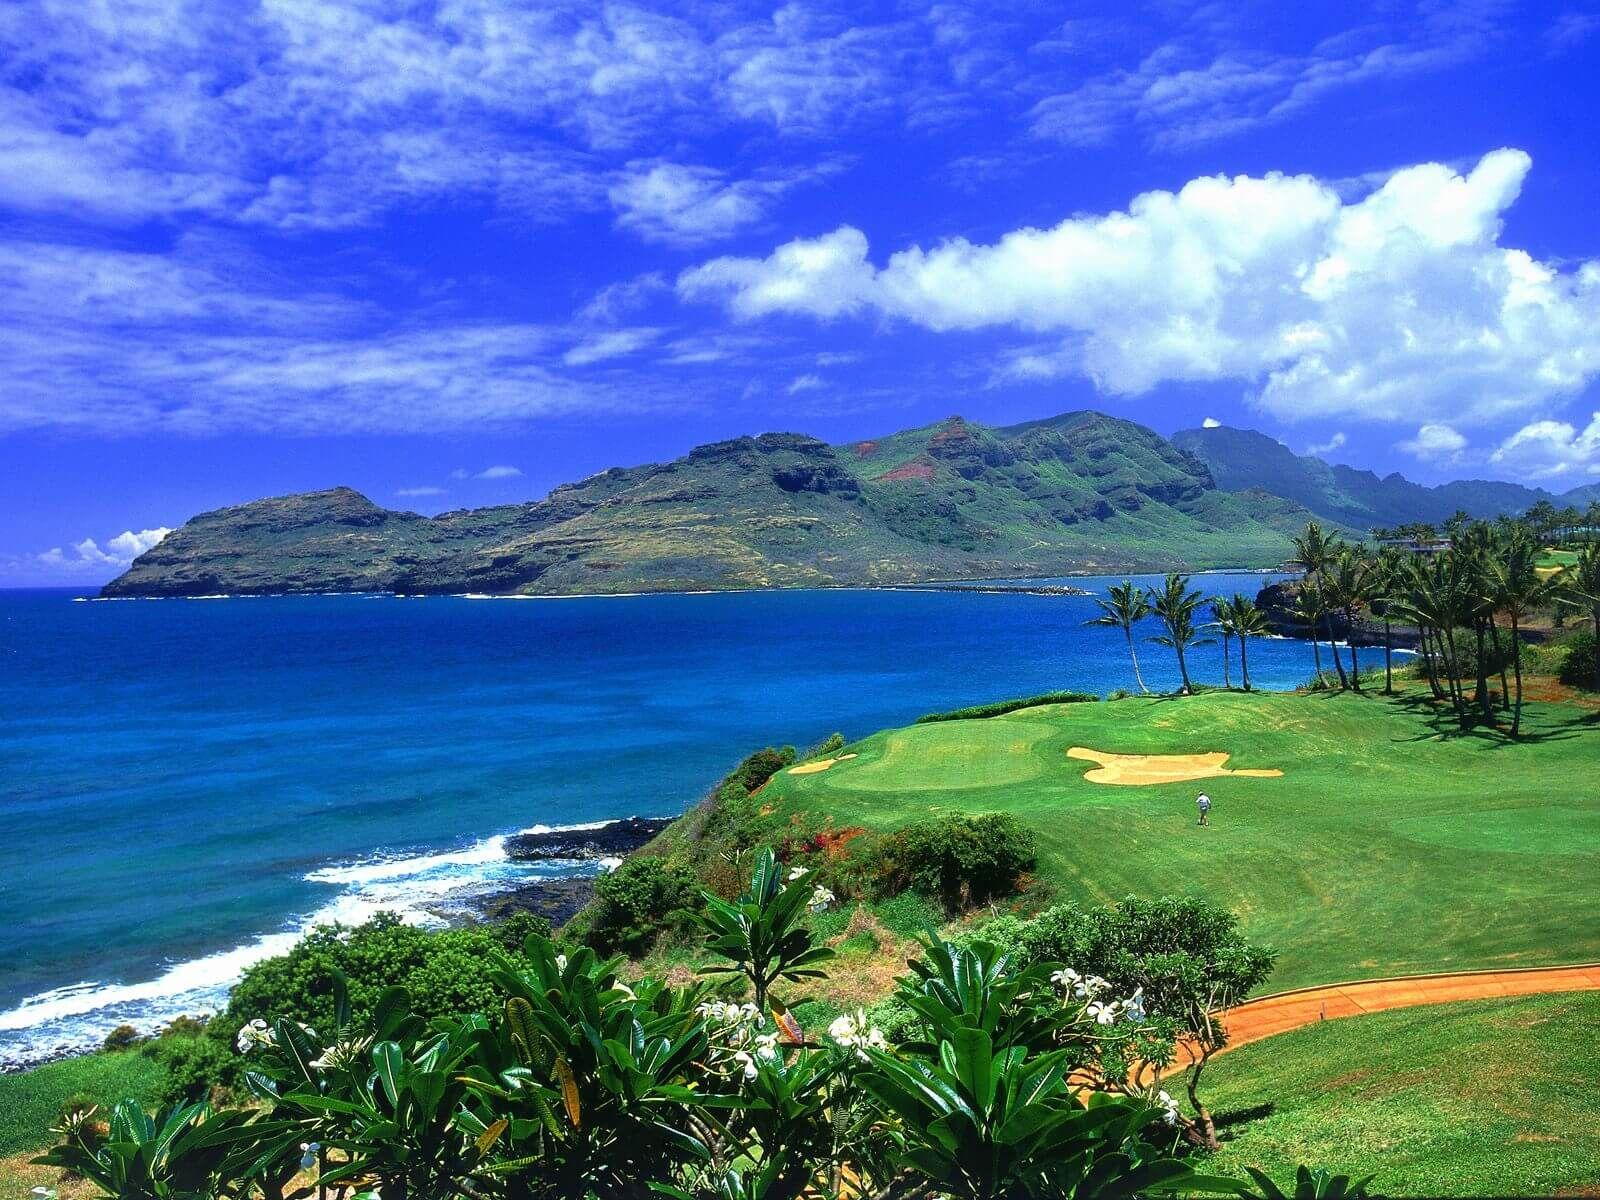 Golf Hawaii Normal Hd Wallpapers High Definition 100 Hd Quality Landscape Wallpaper Hawaii Golf Hawaii Landscape